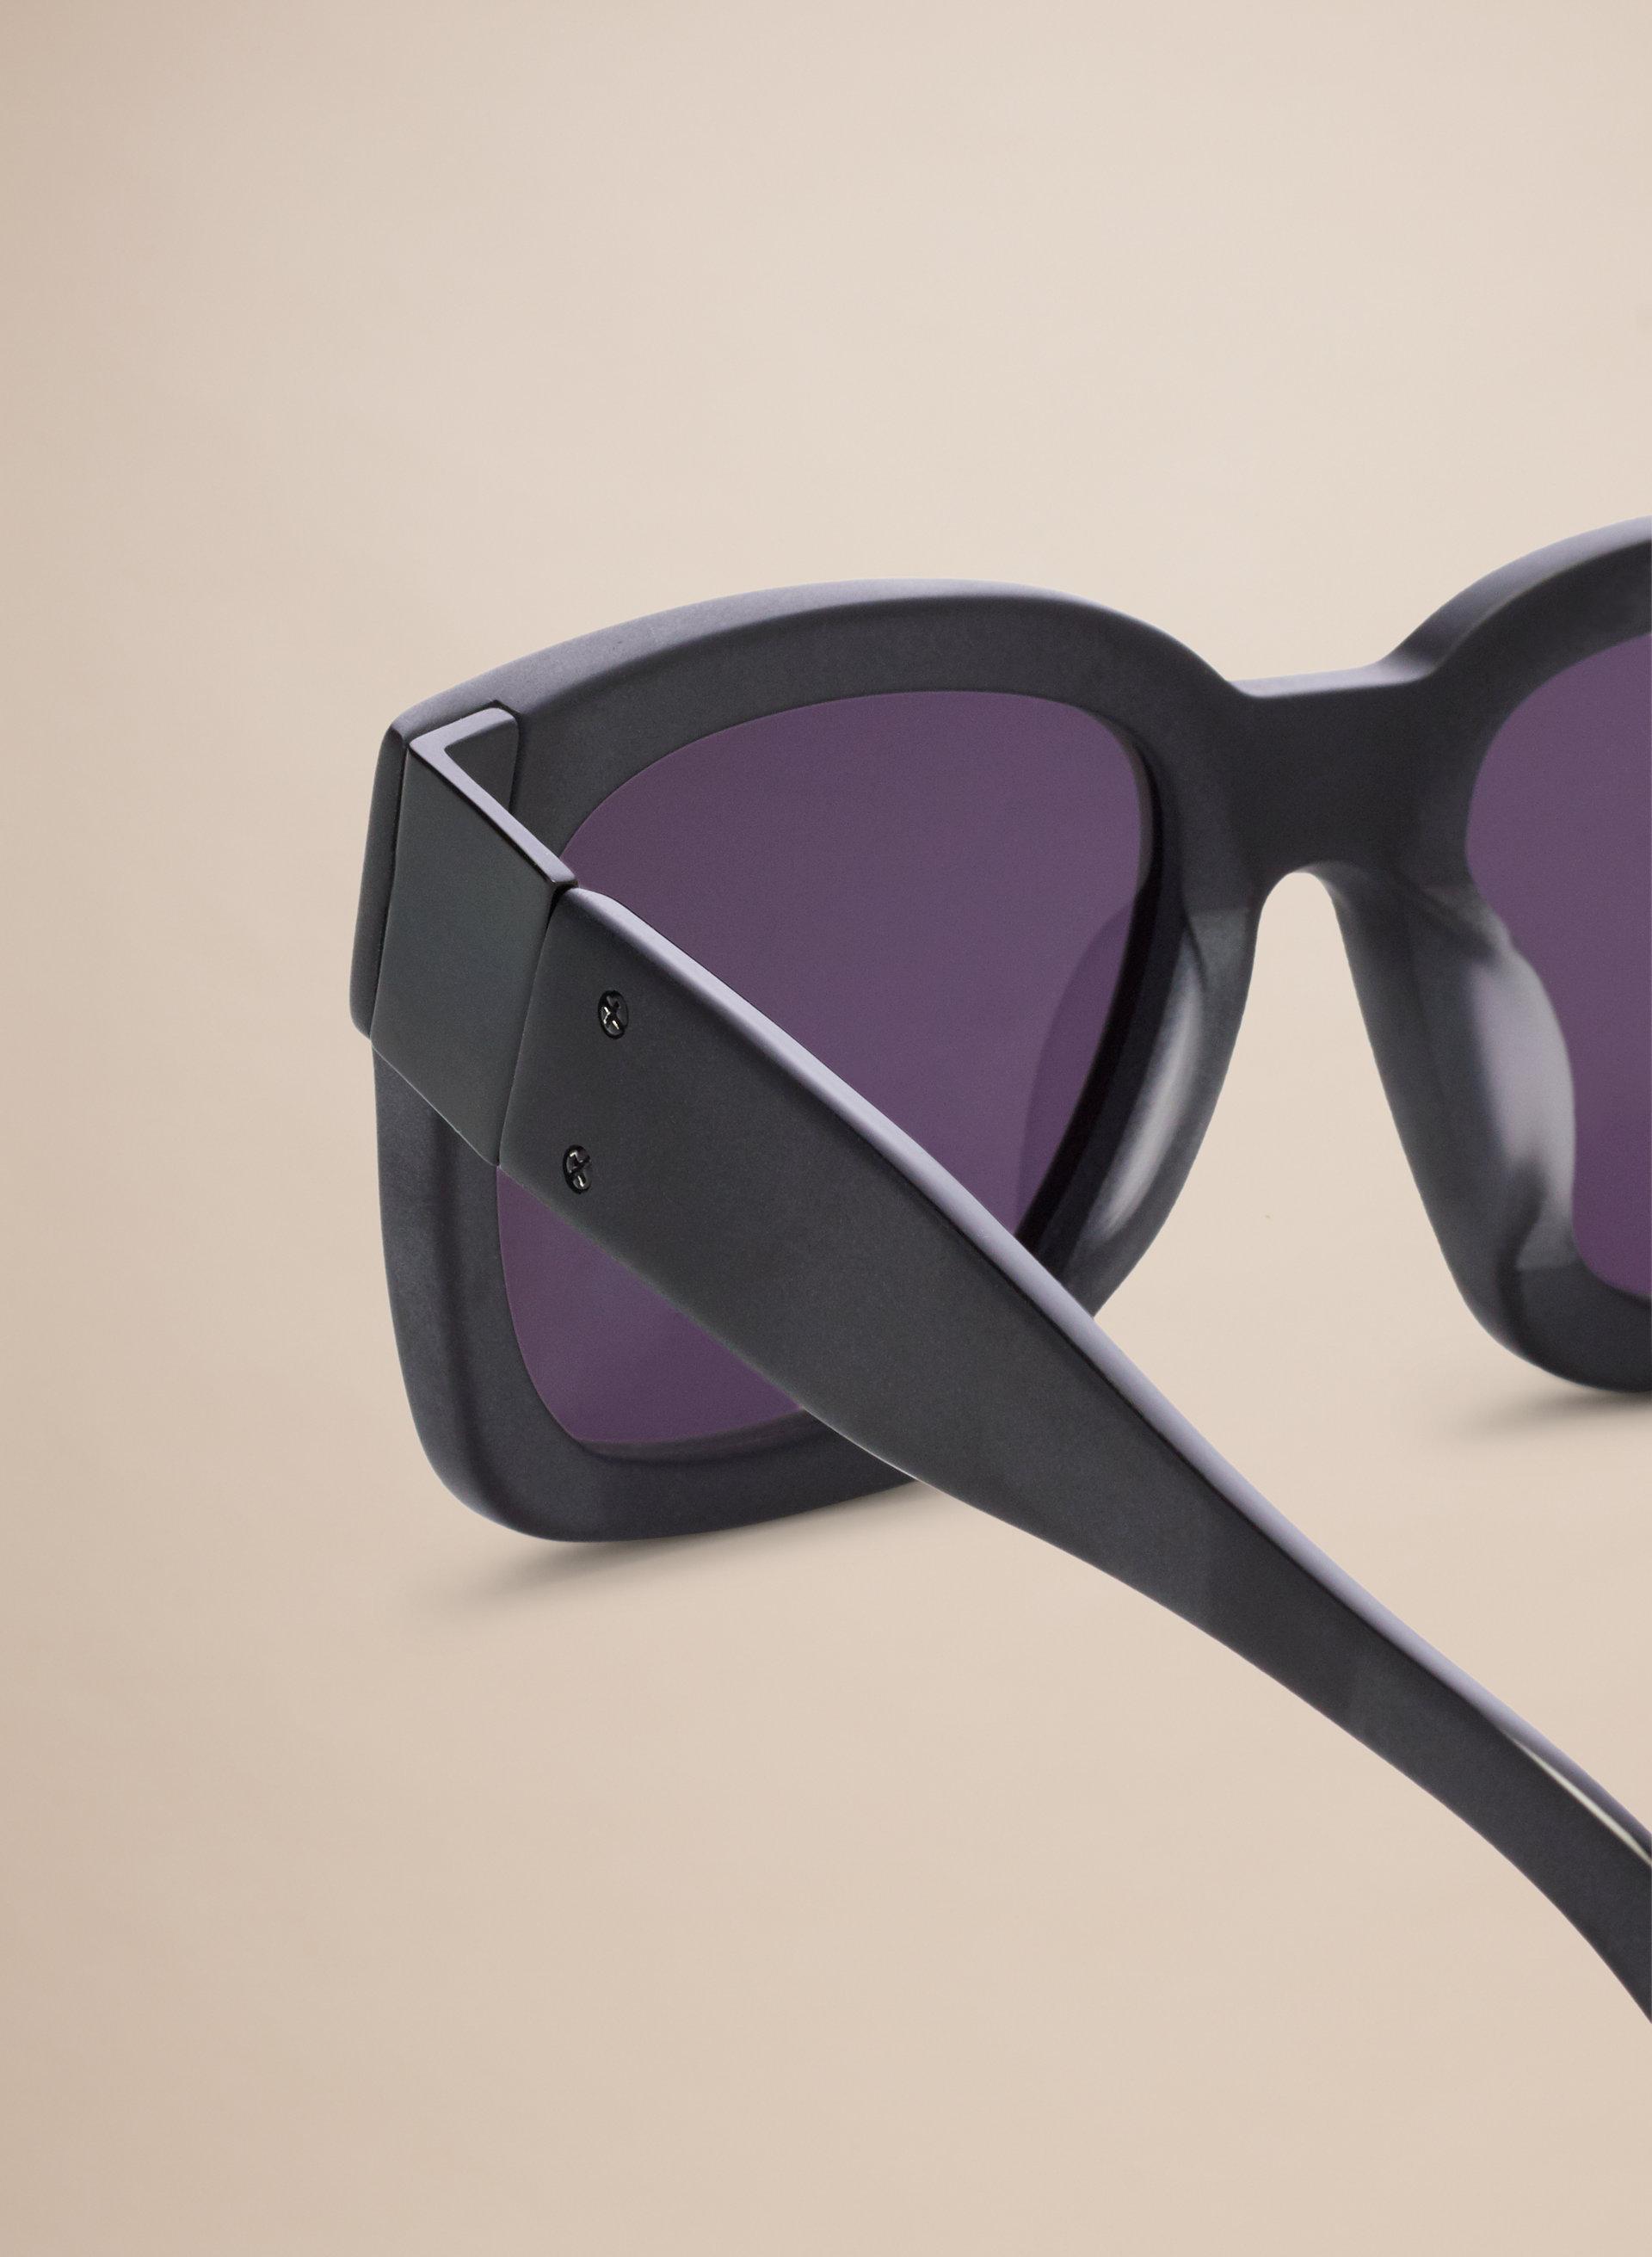 C4 Eyewear x Susie Wall SHADOW SUNGLASSES   Aritzia CA